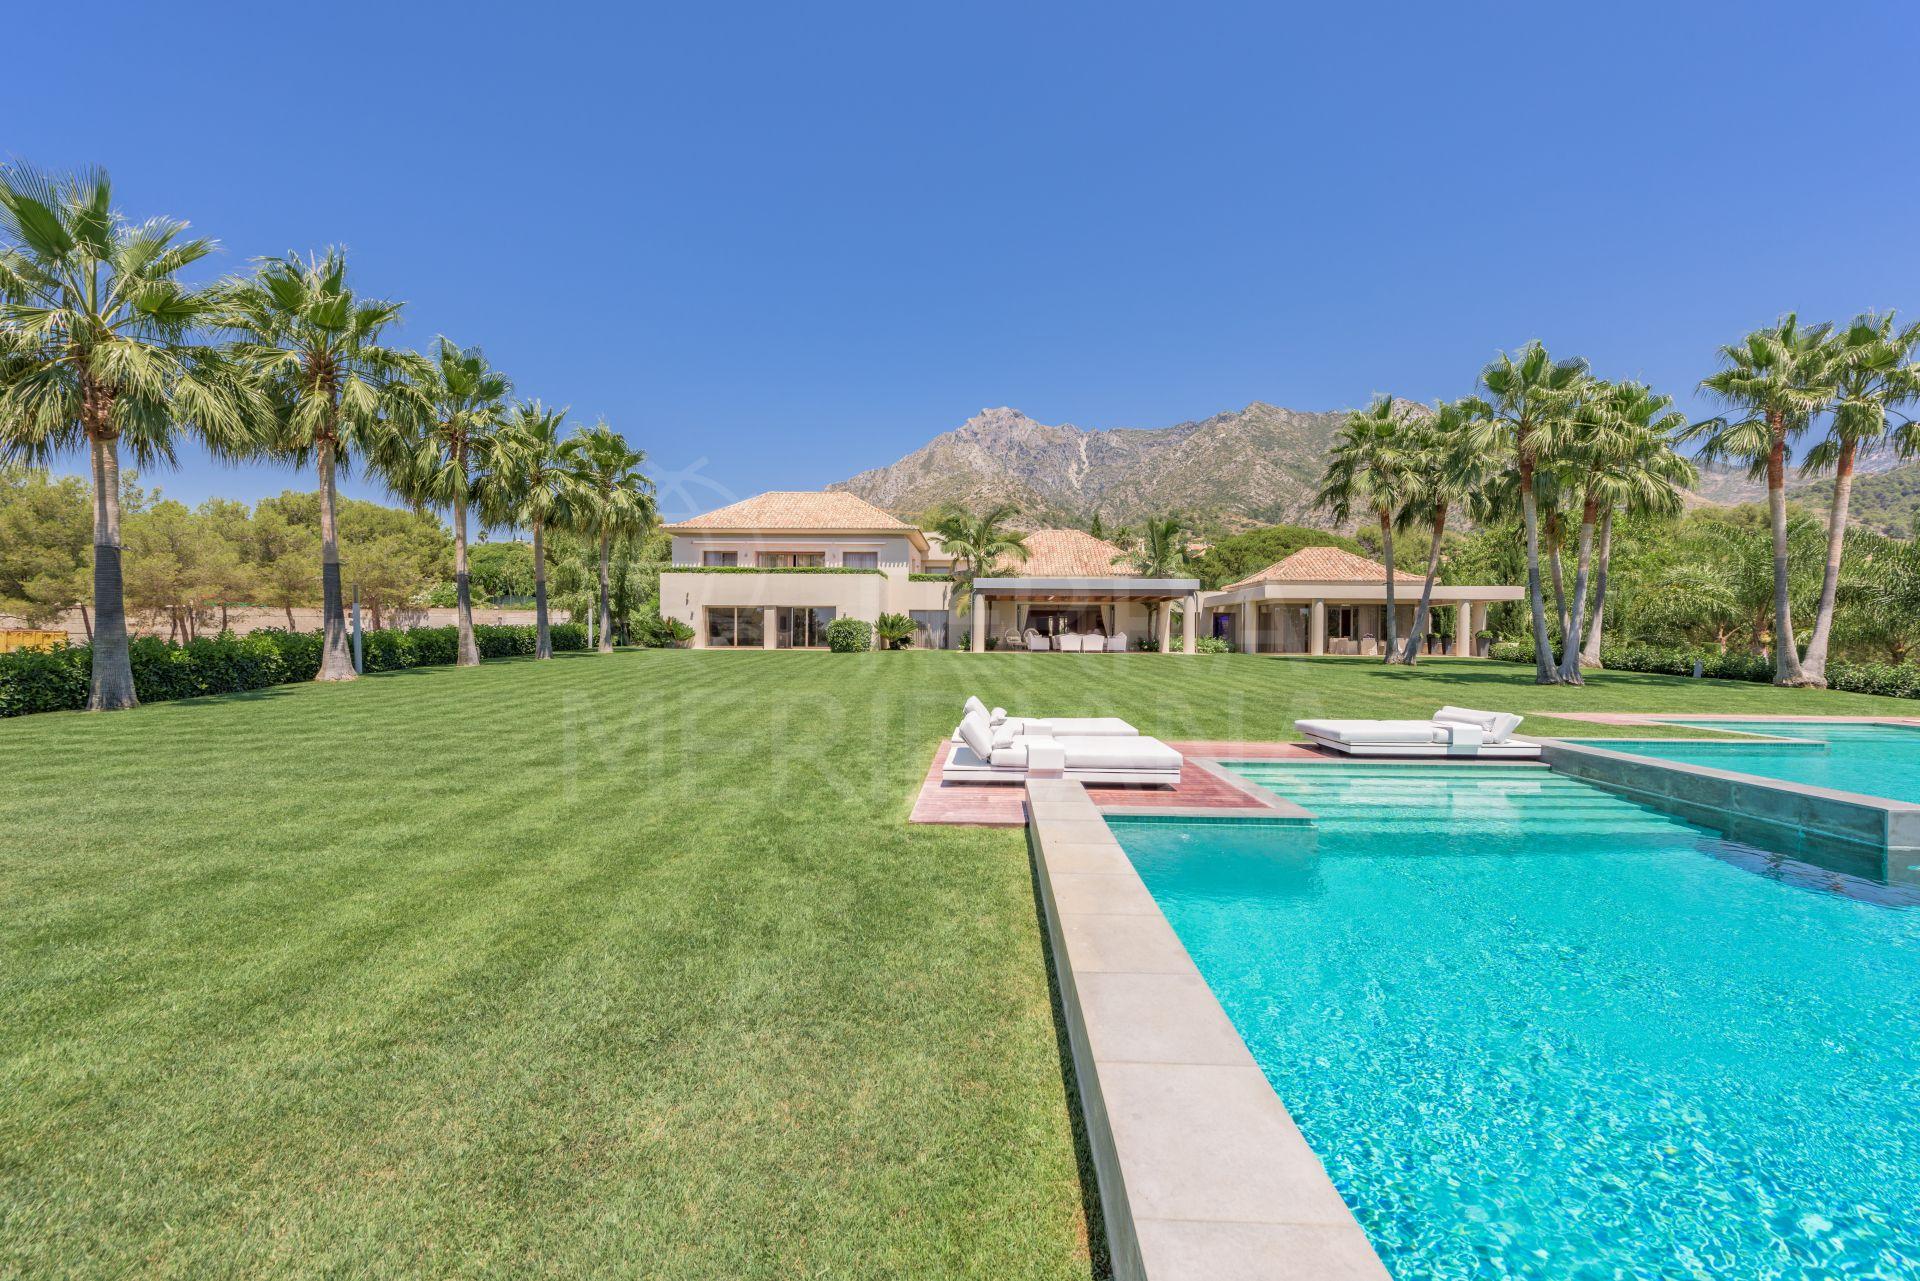 Exquisite Modern Luxury Villa For Sale In La Quinta De Sierra Blanca Marbella Golden Mile